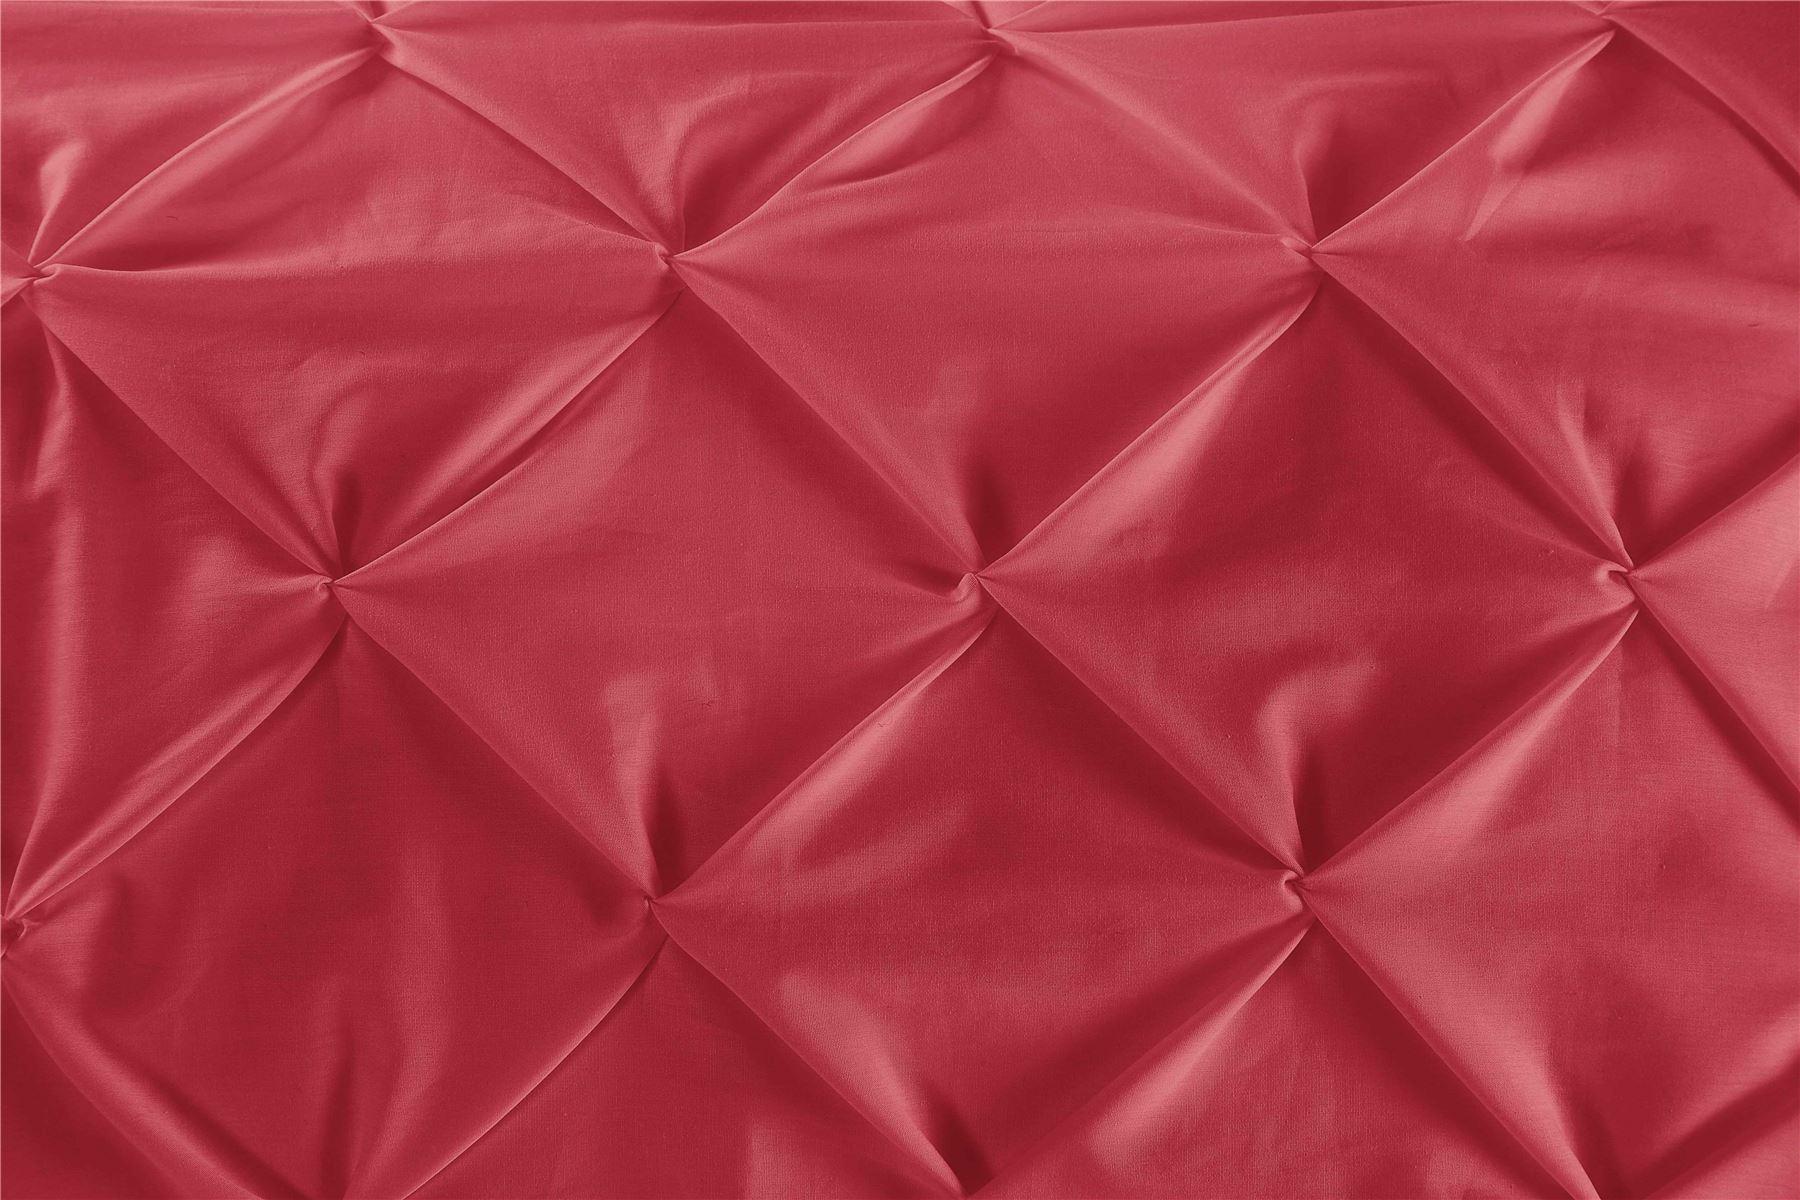 Luxury-Pure-100-Cotton-200-Thread-Pinch-Pleat-Pintuck-Puckering-Duvet-Cover-Set thumbnail 41